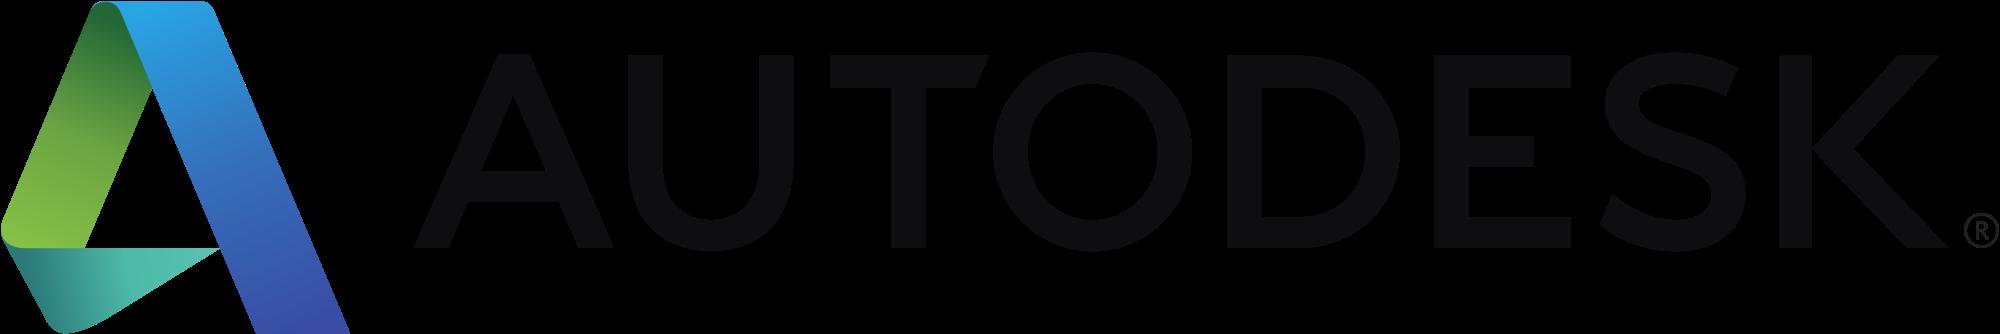 1455786593_Autodesk_Logo